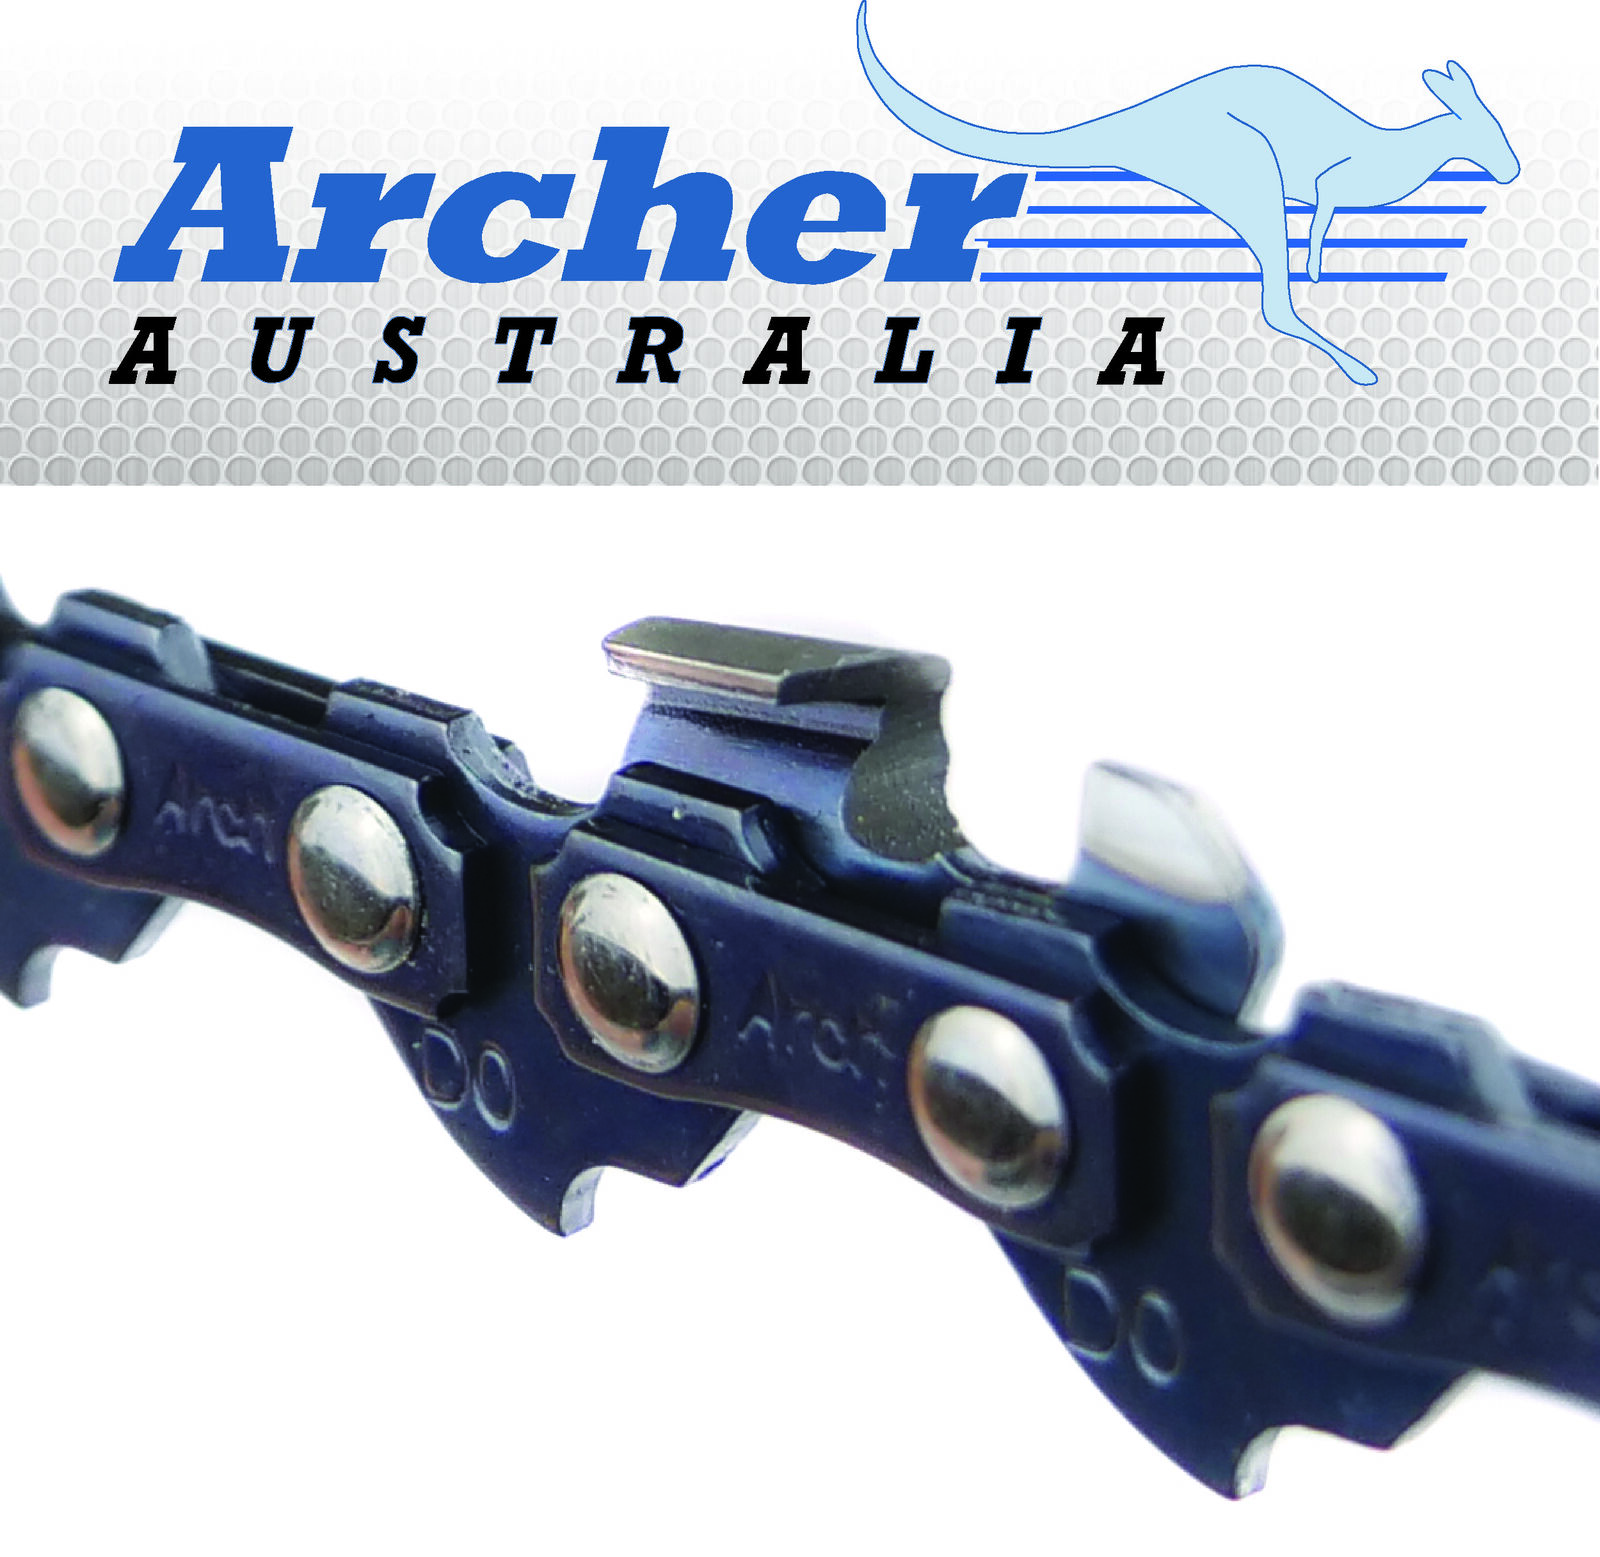 sconto 5 5 5 Archer 3 8 LP, 3 8LP, .043 1.1mm 50 DL Drive LINK MOTOSEGA SAW CATENE Loop  acquisti online